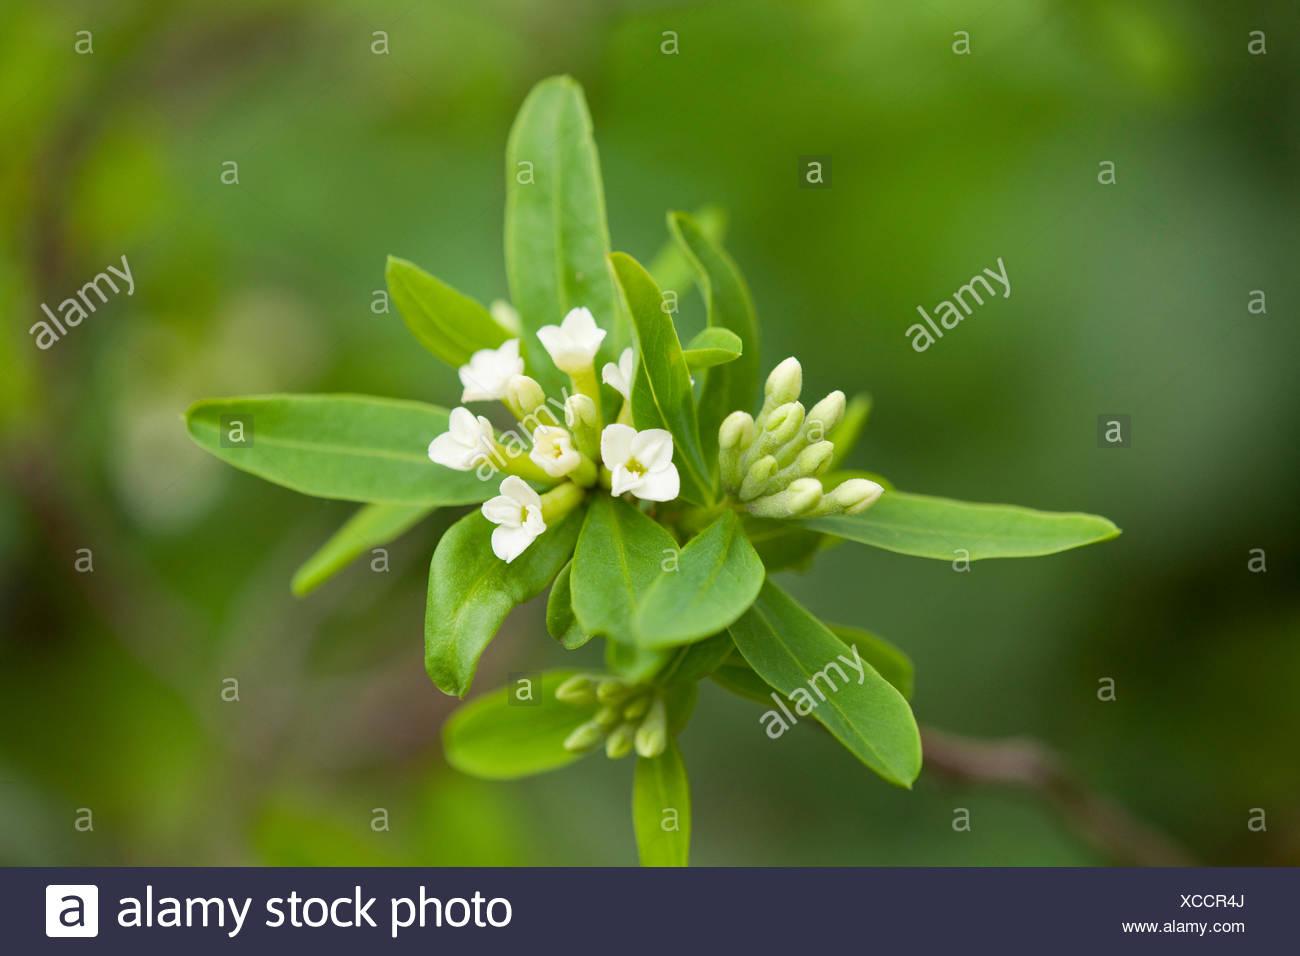 Daphne axilliflora, flowering, Thuringia, Germany - Stock Image